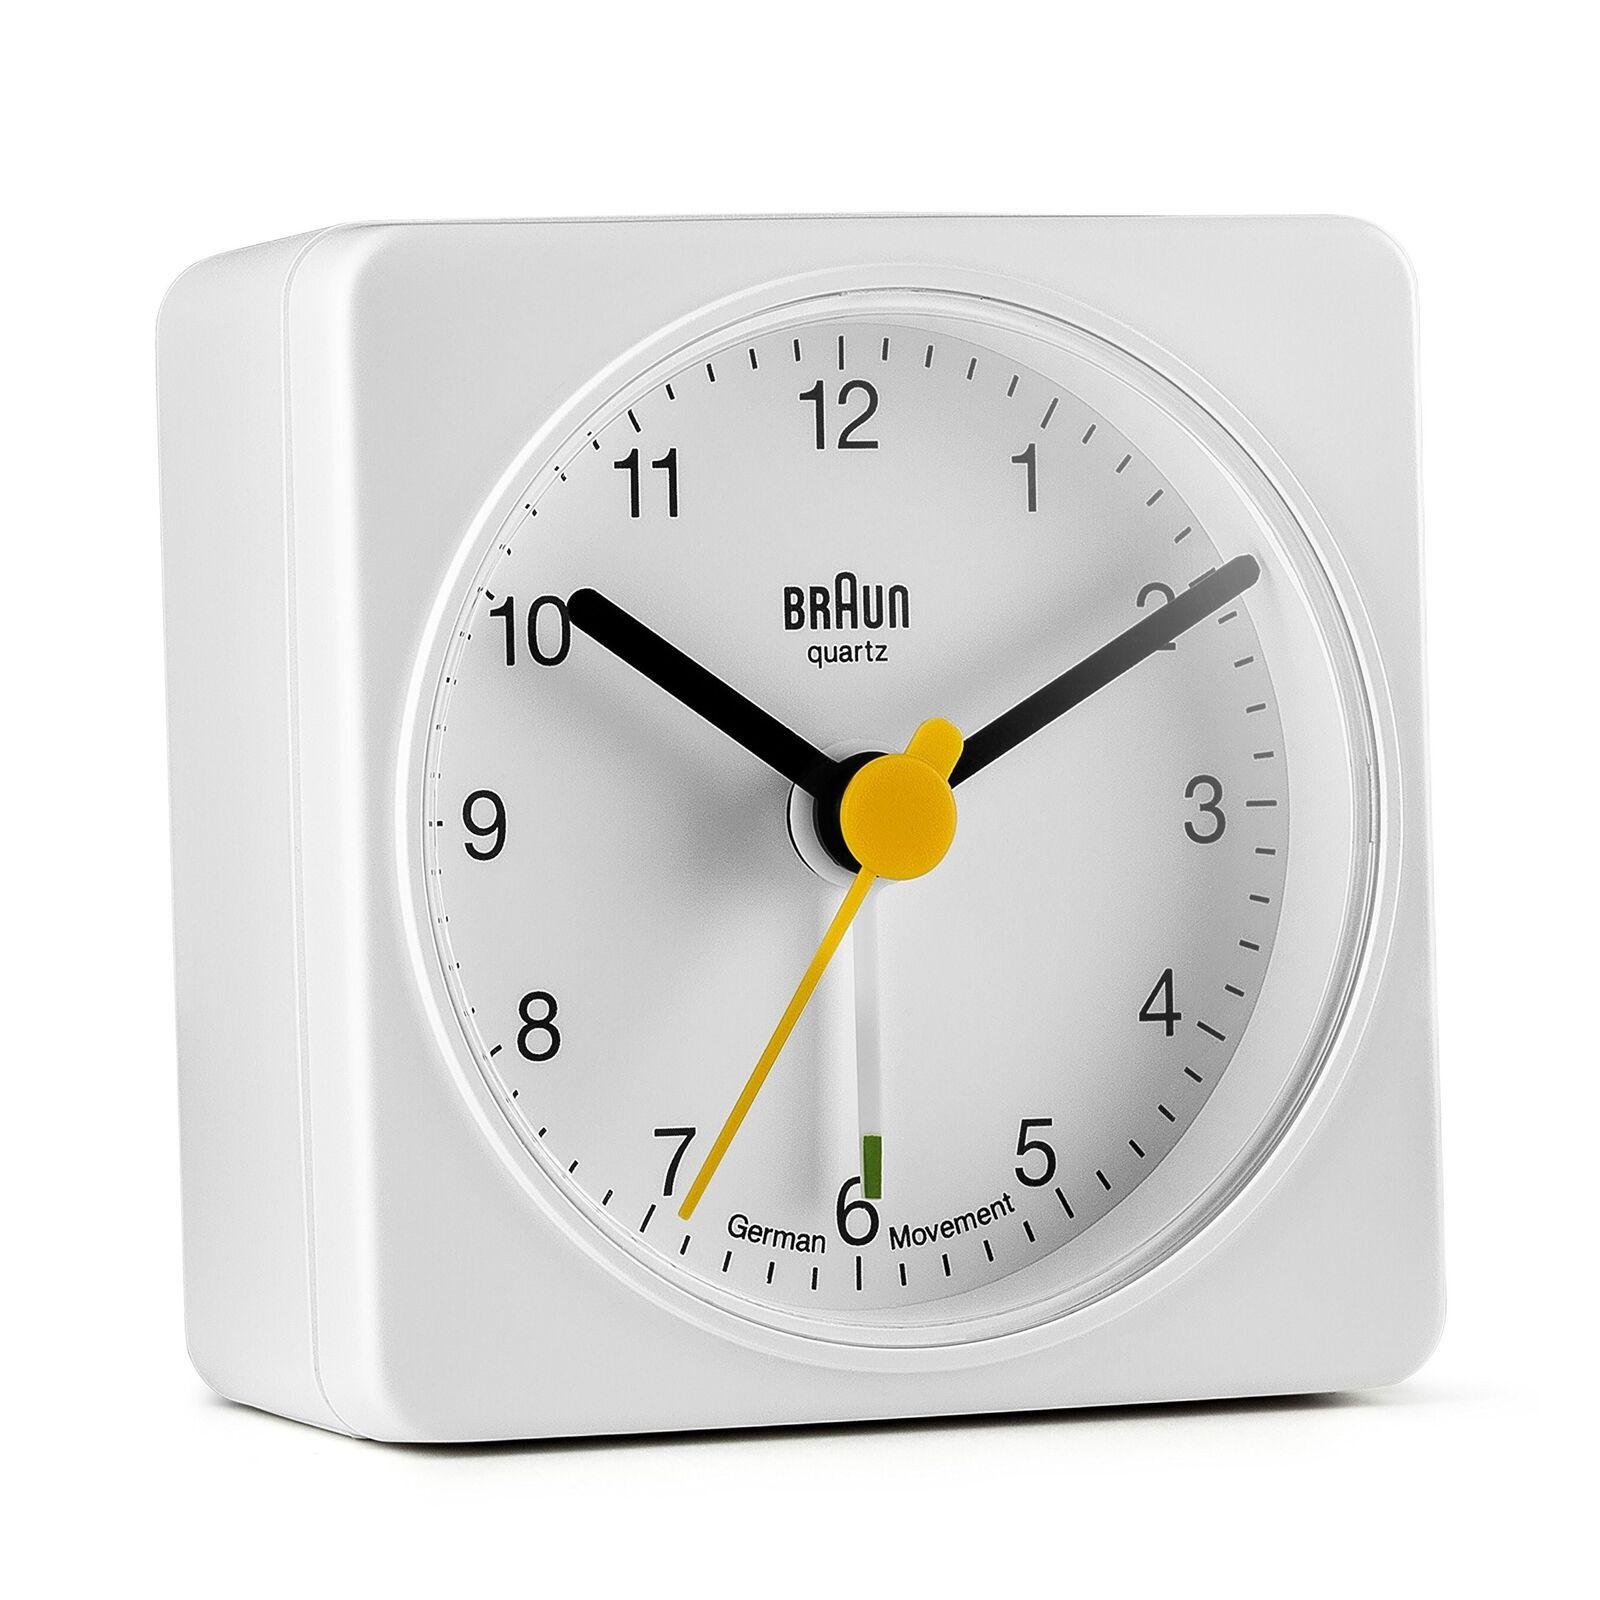 Braun Bnc002whwh Classic Analog Quartz Alarm Clock Ebay Travel Alarm Clock Alarm Clock Clock